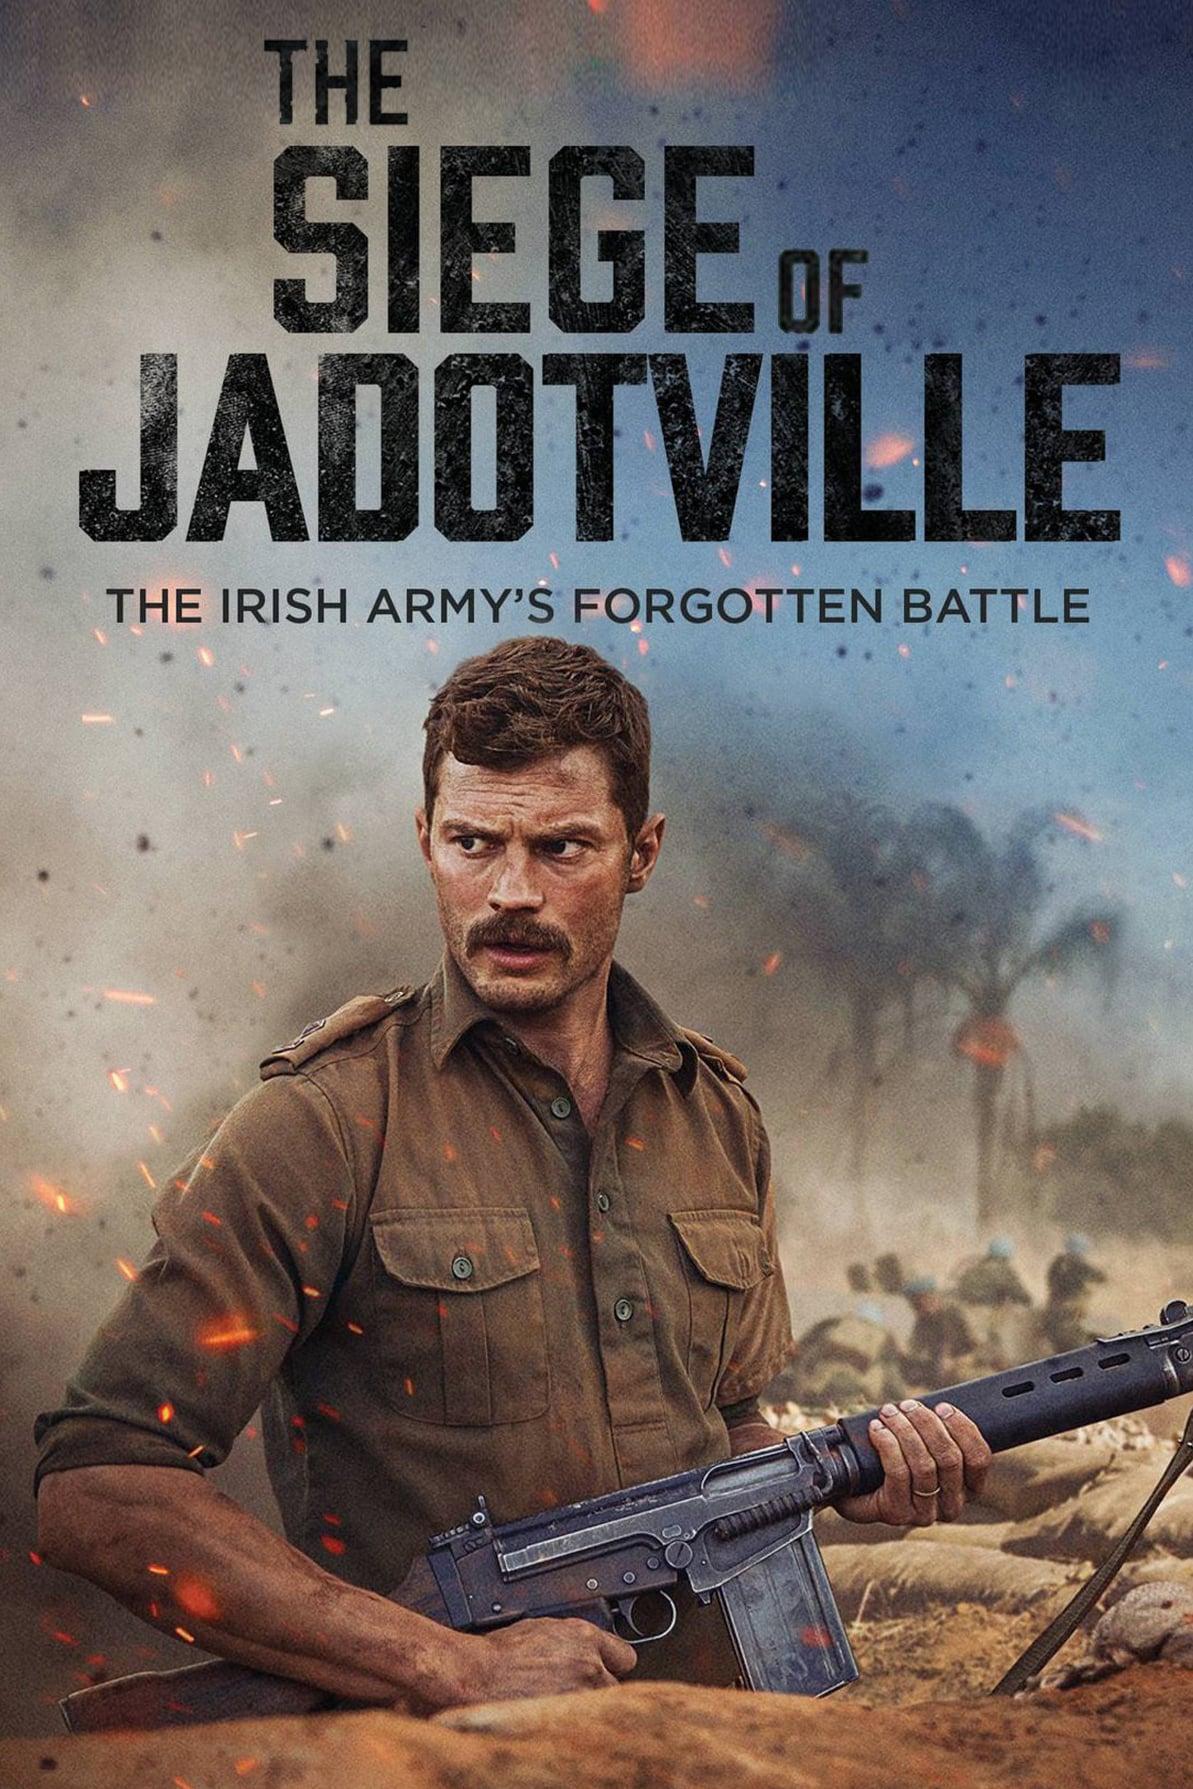 the siege of jadotville - Sound Effects Editor